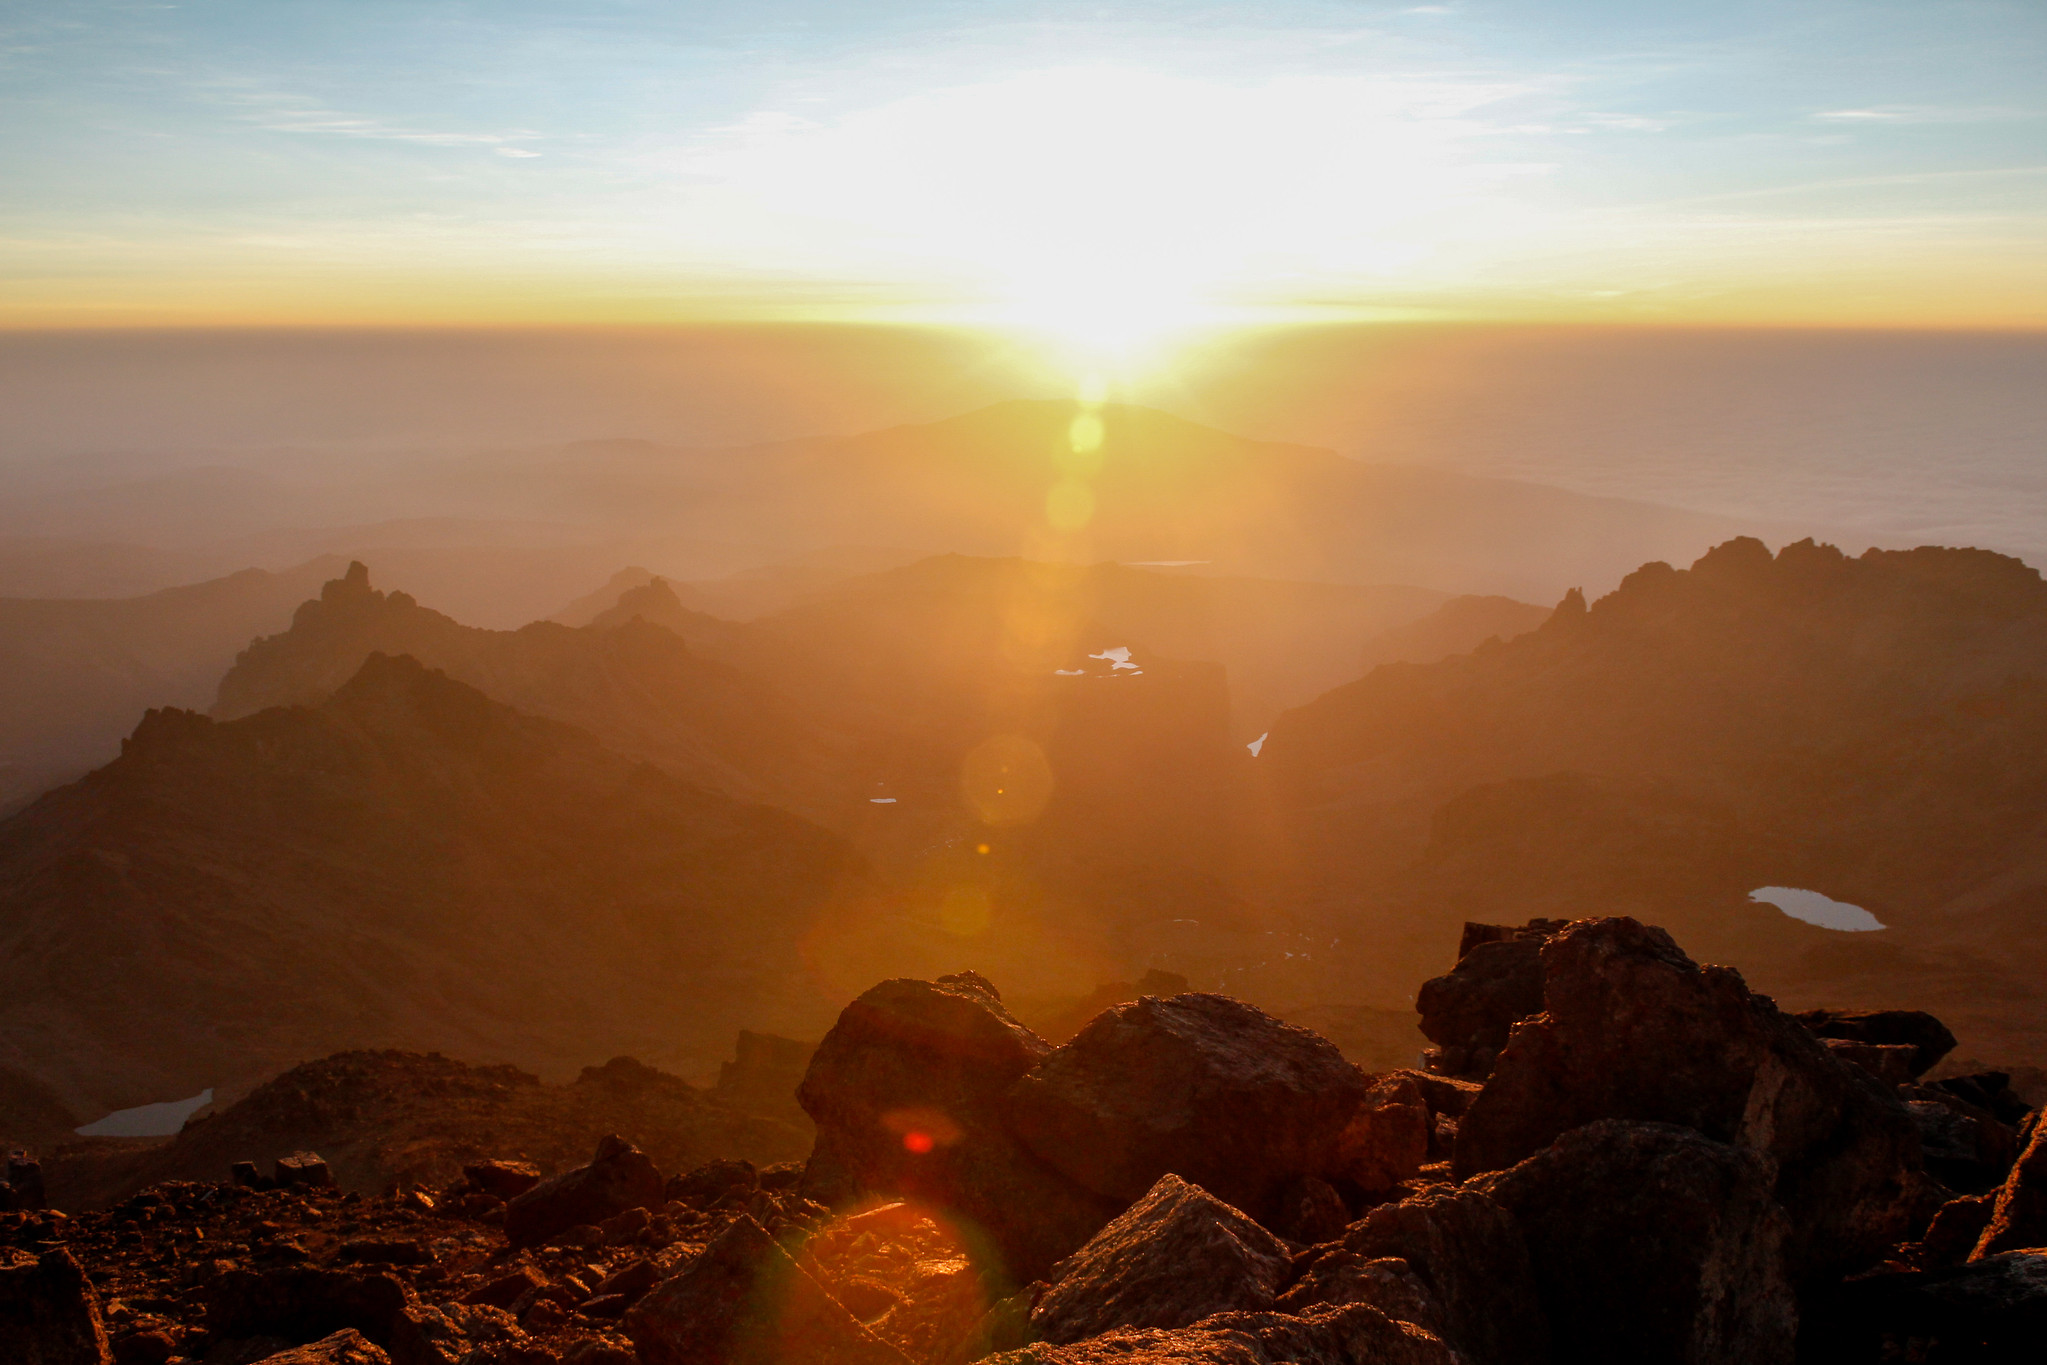 Mount Kenya National Park - Hiking & trekking in Africa